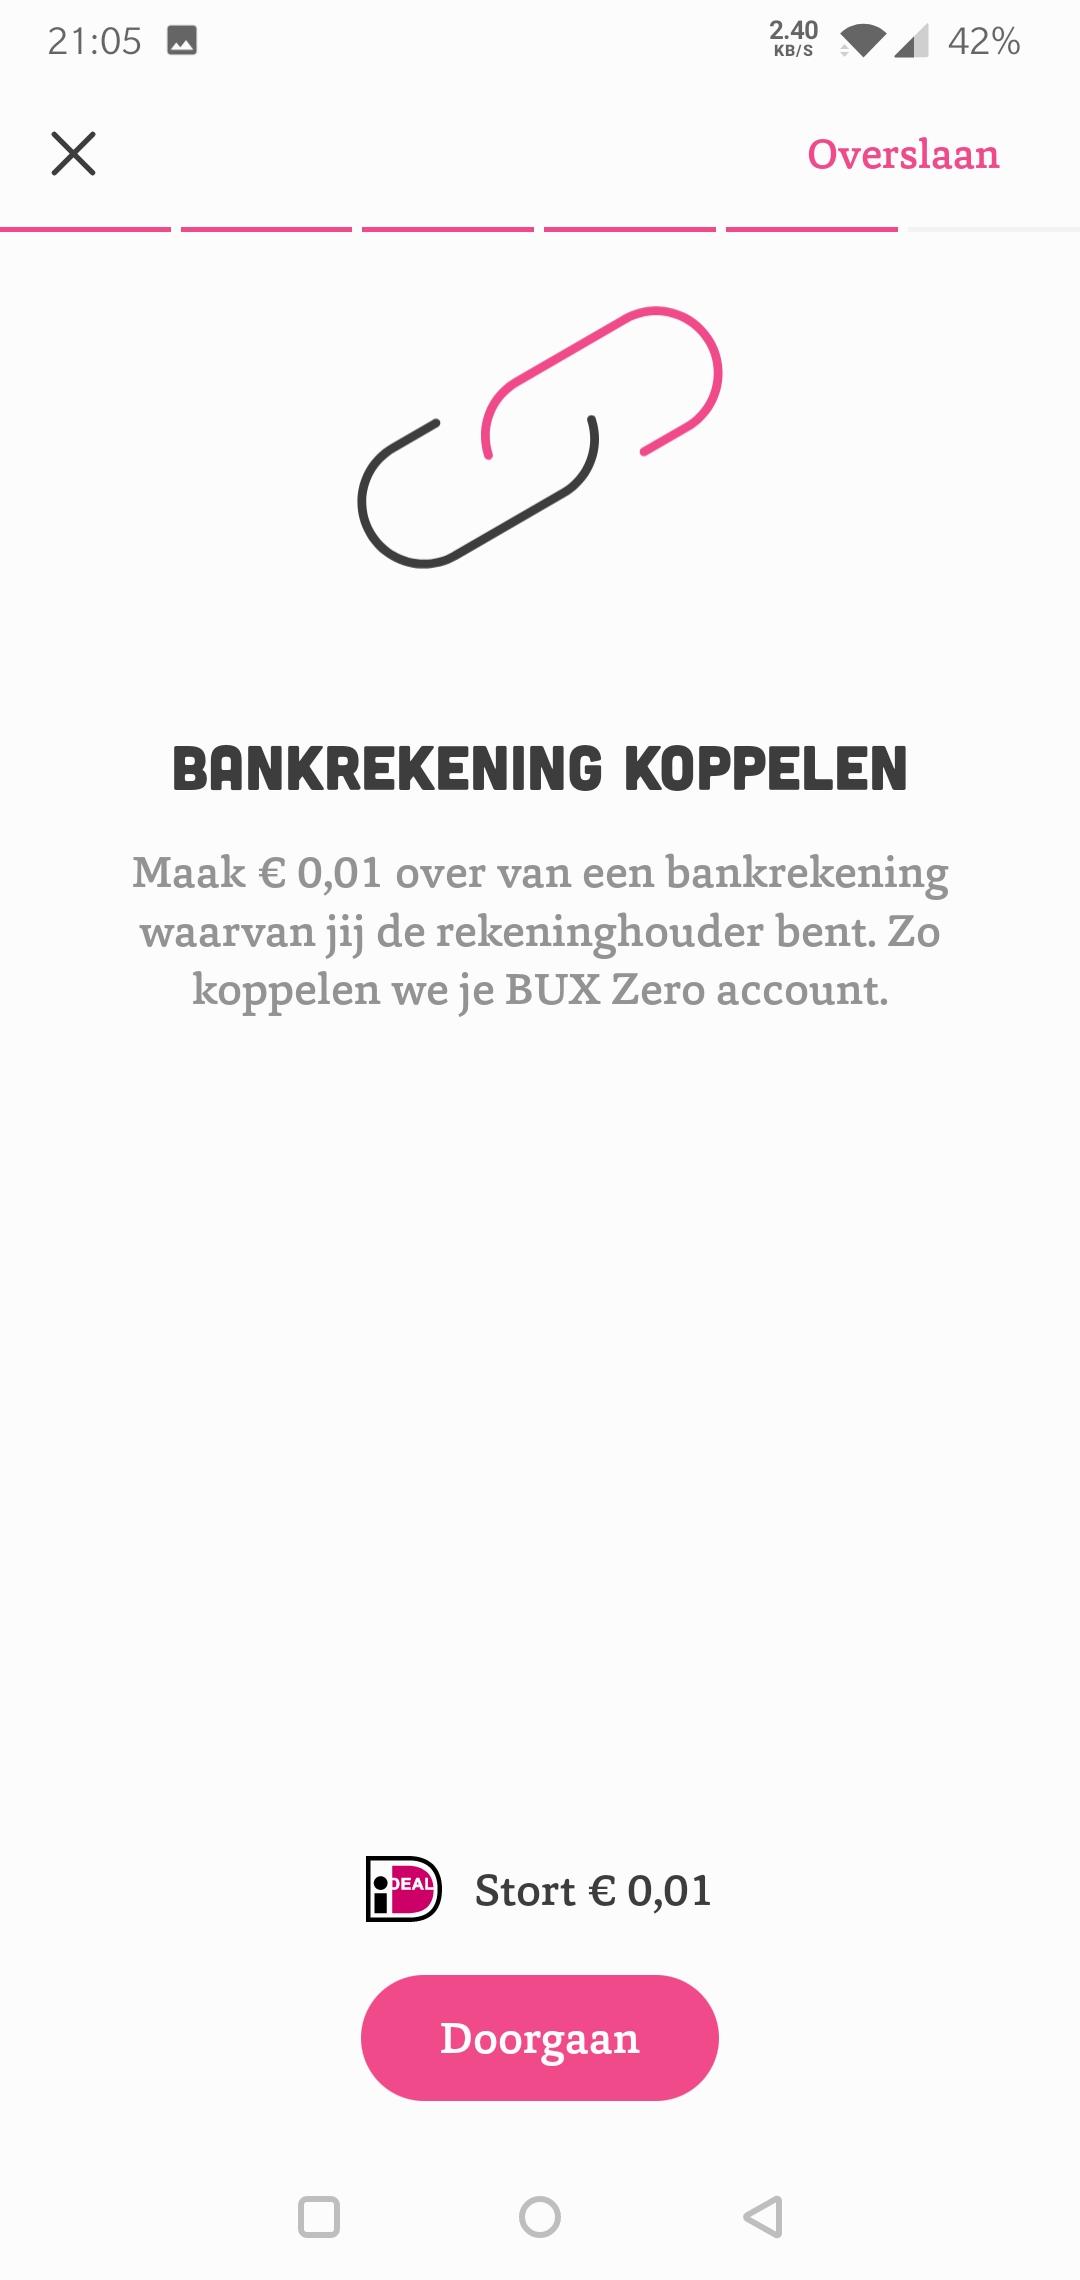 Bux Zero bankrekening koppelen